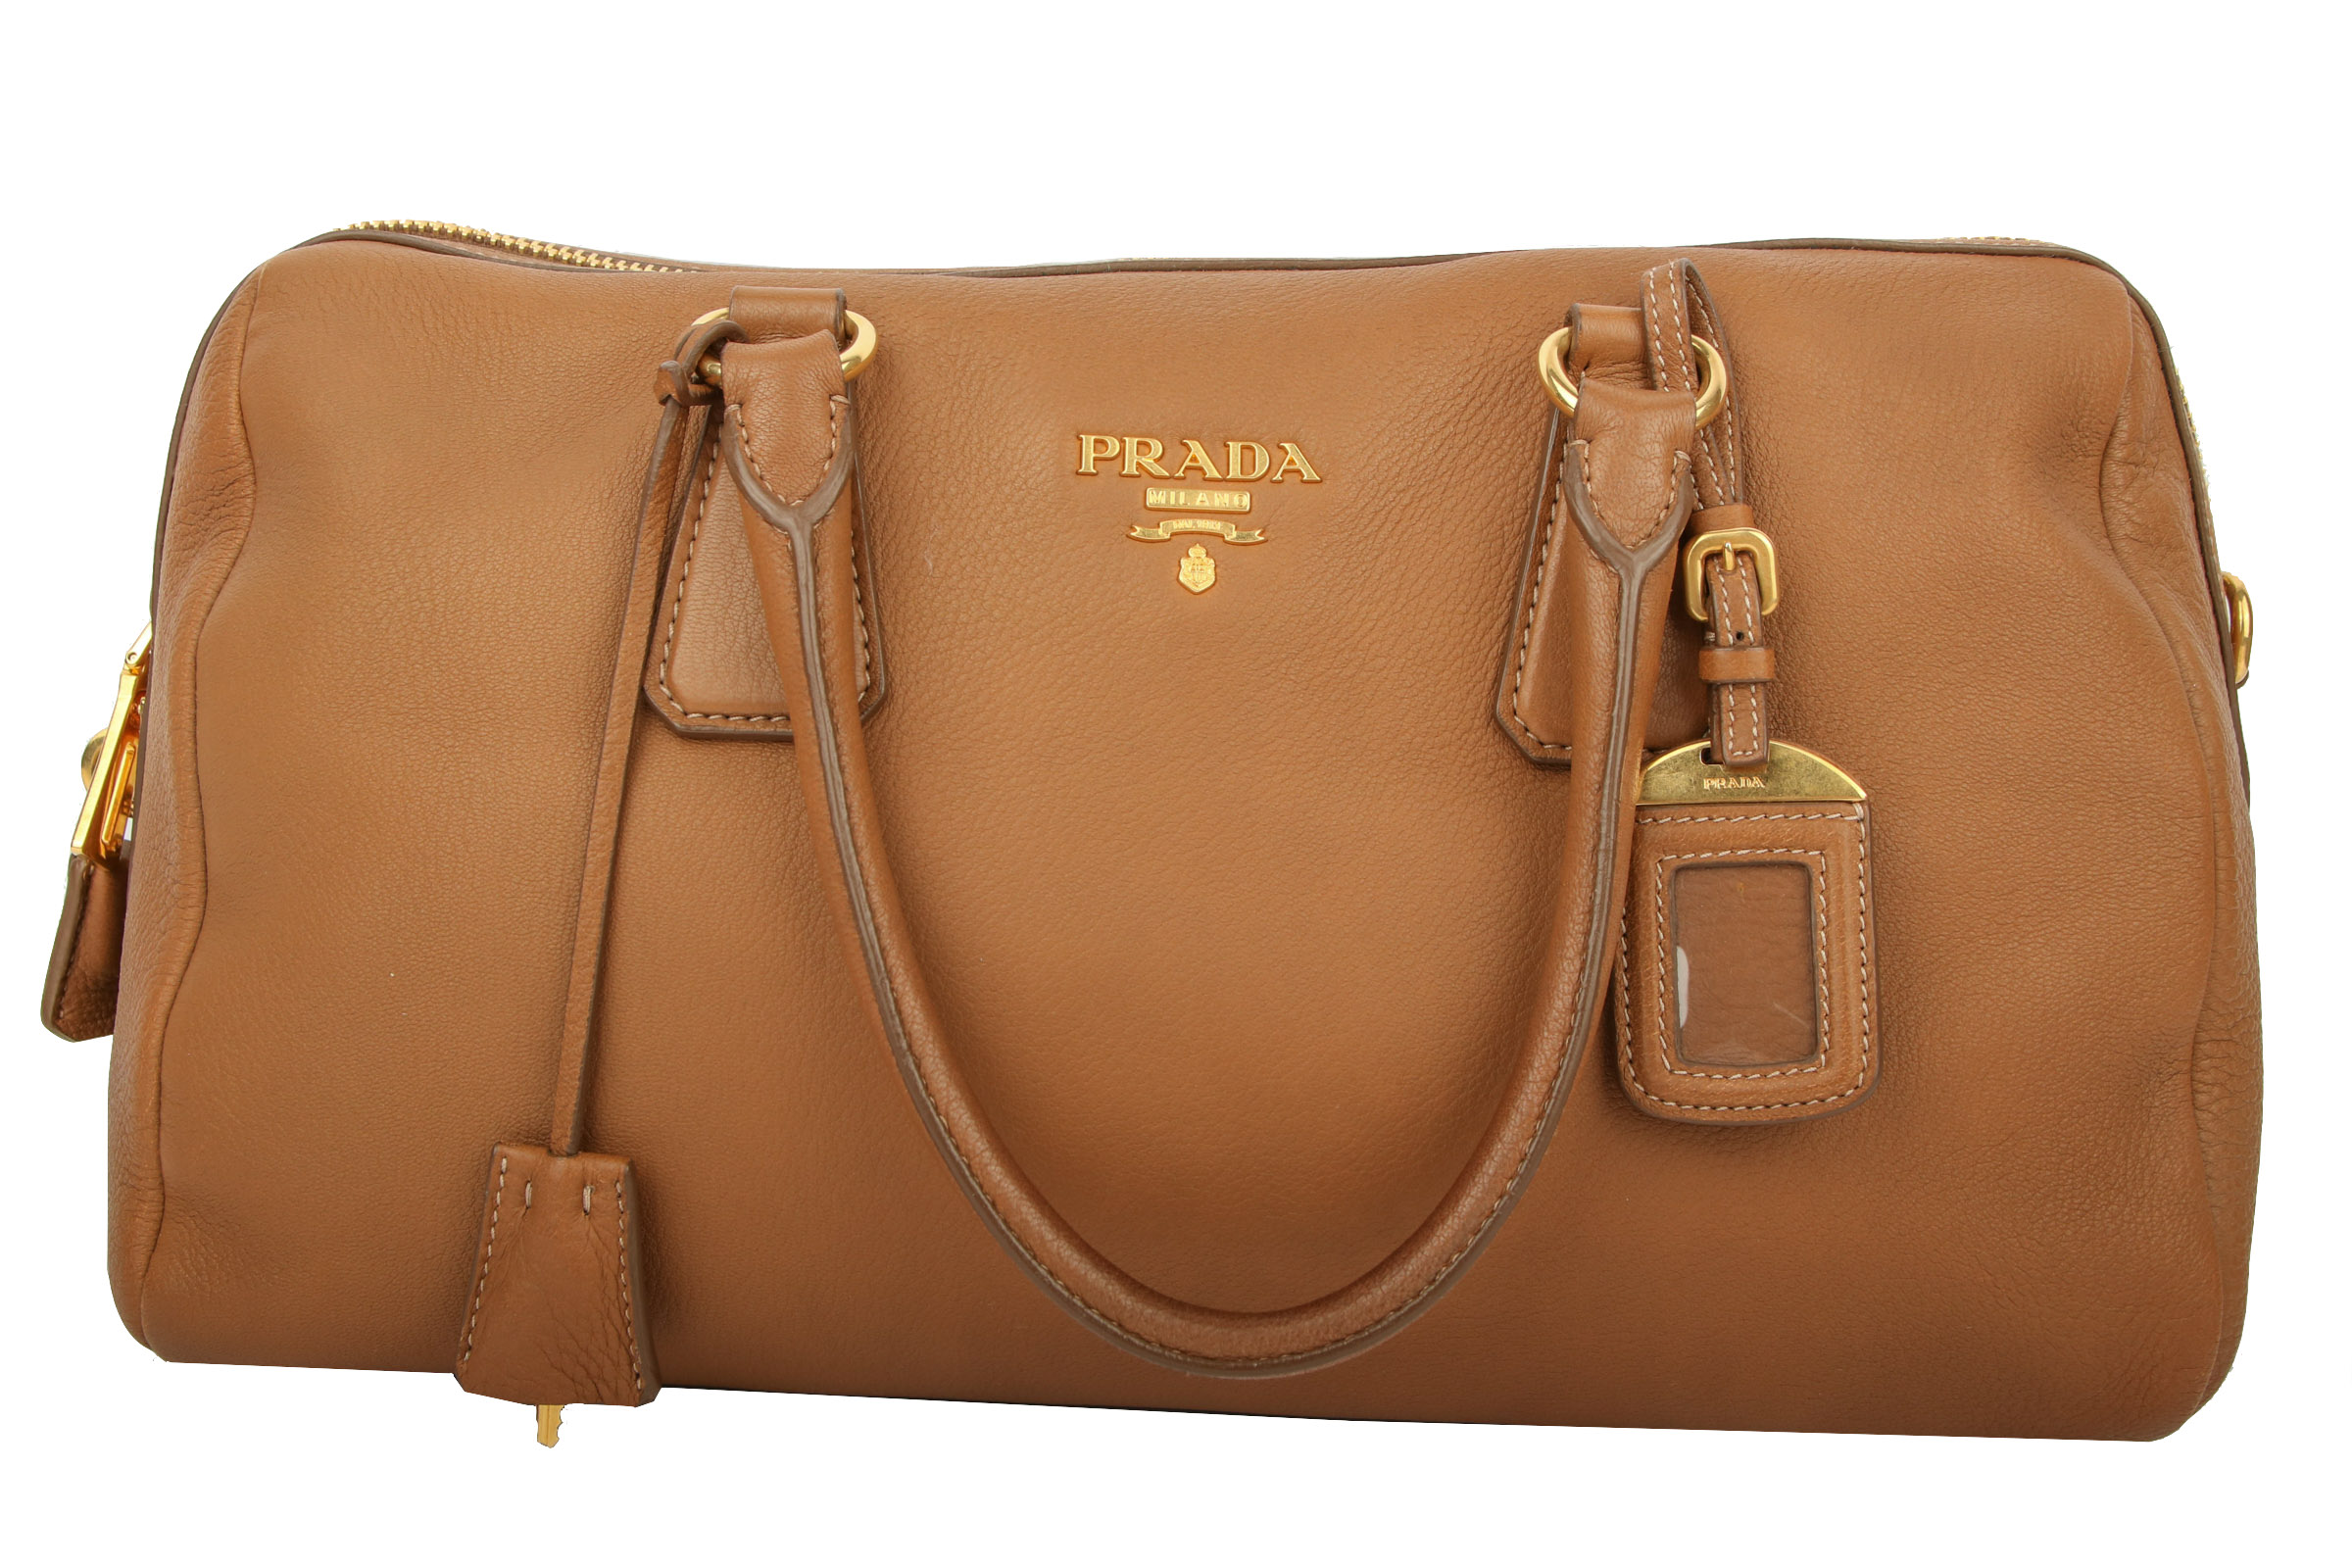 440eb4fa2a295 Prada Handbags   Accessories